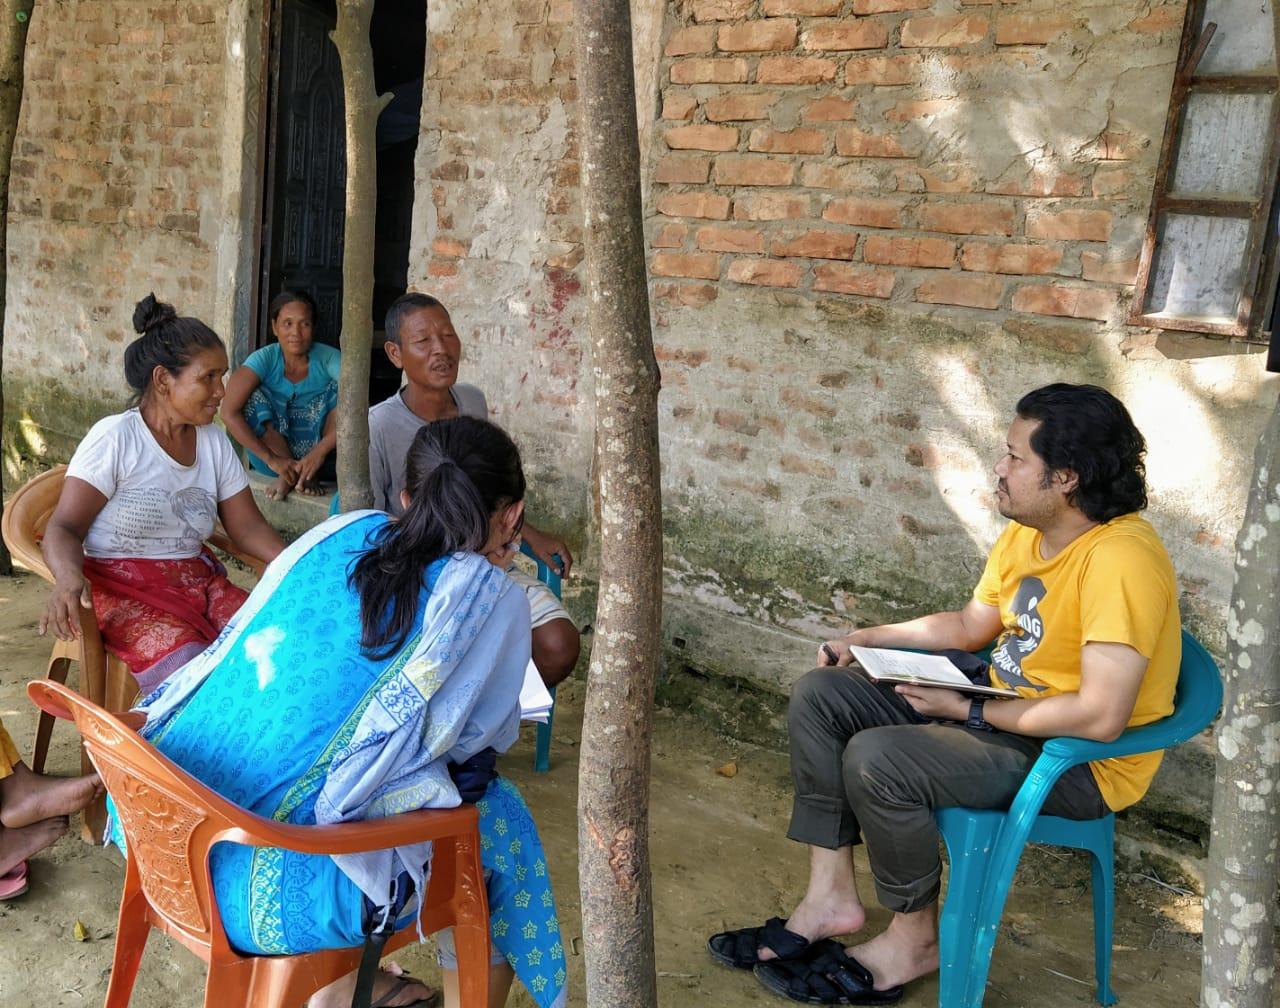 Khonila Snal (57), a Garo woman from Bangalvita village of Tahirpur Upazila under Sunamgonj district is being interviewed during field work.